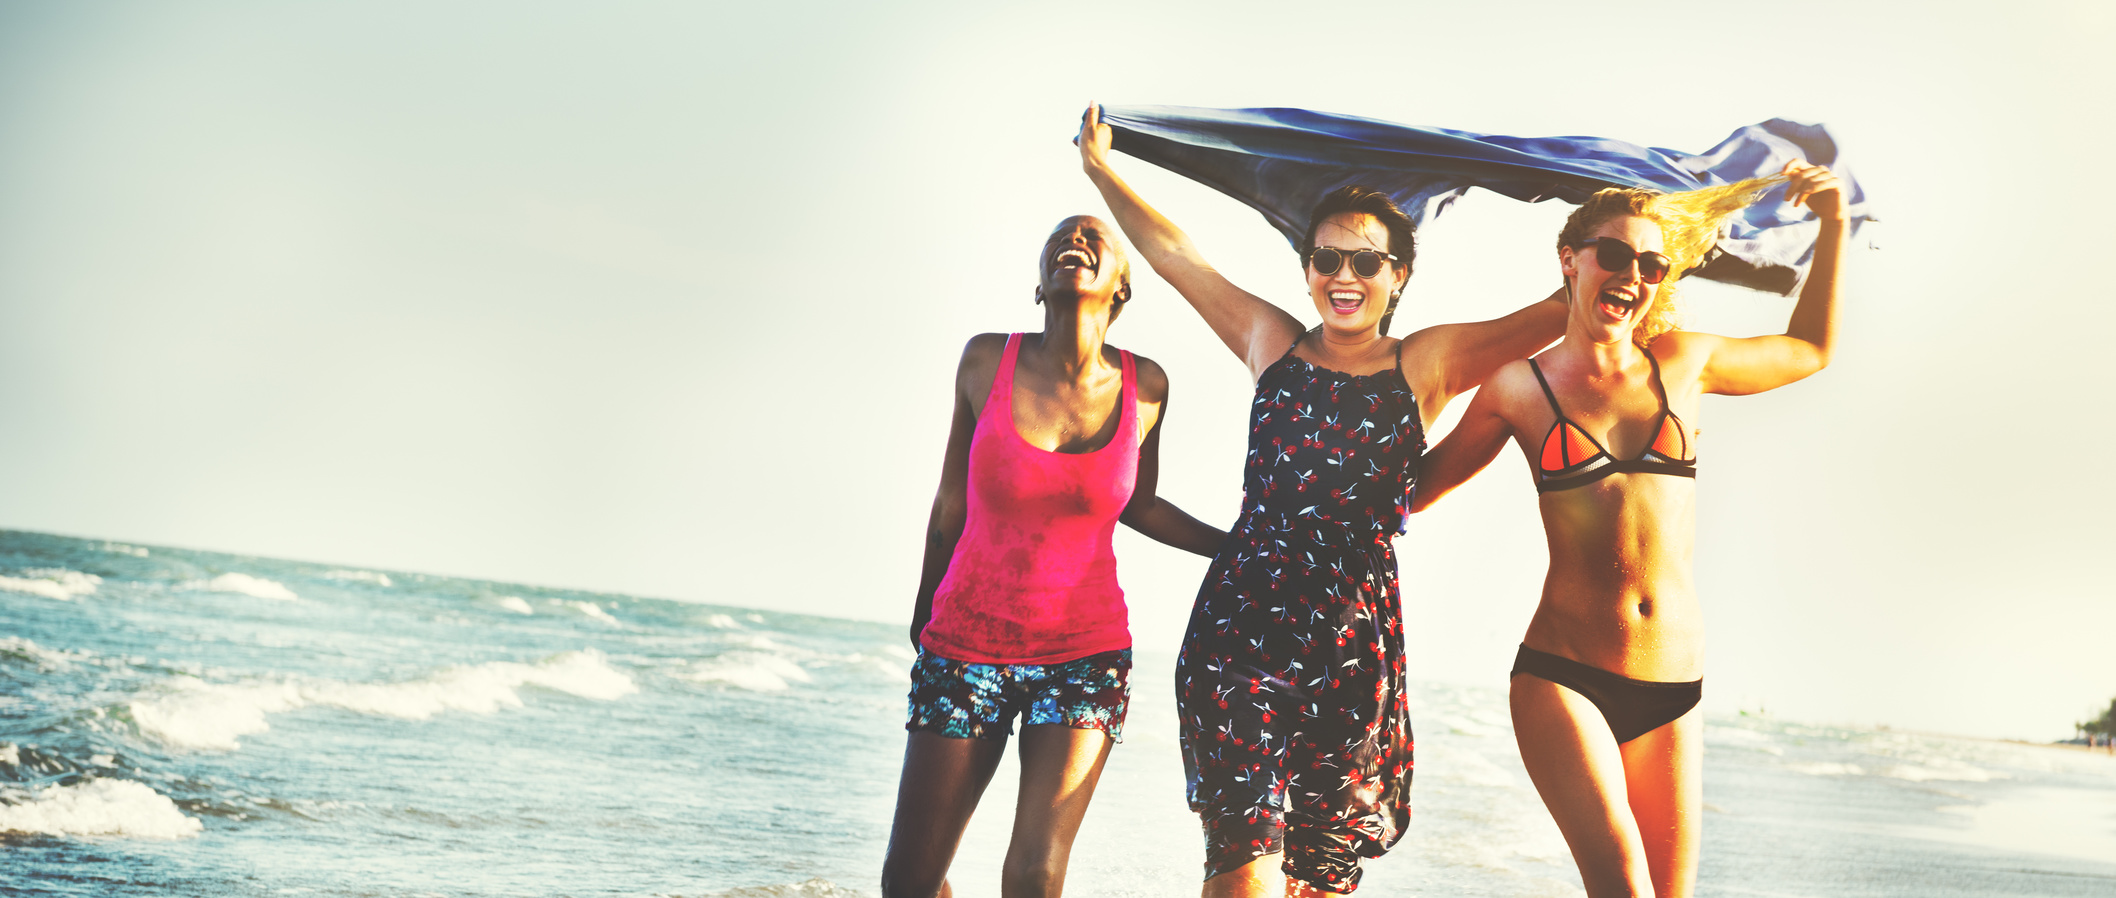 Internships in Spain   Having fun, gain work experience, enjoy yourself